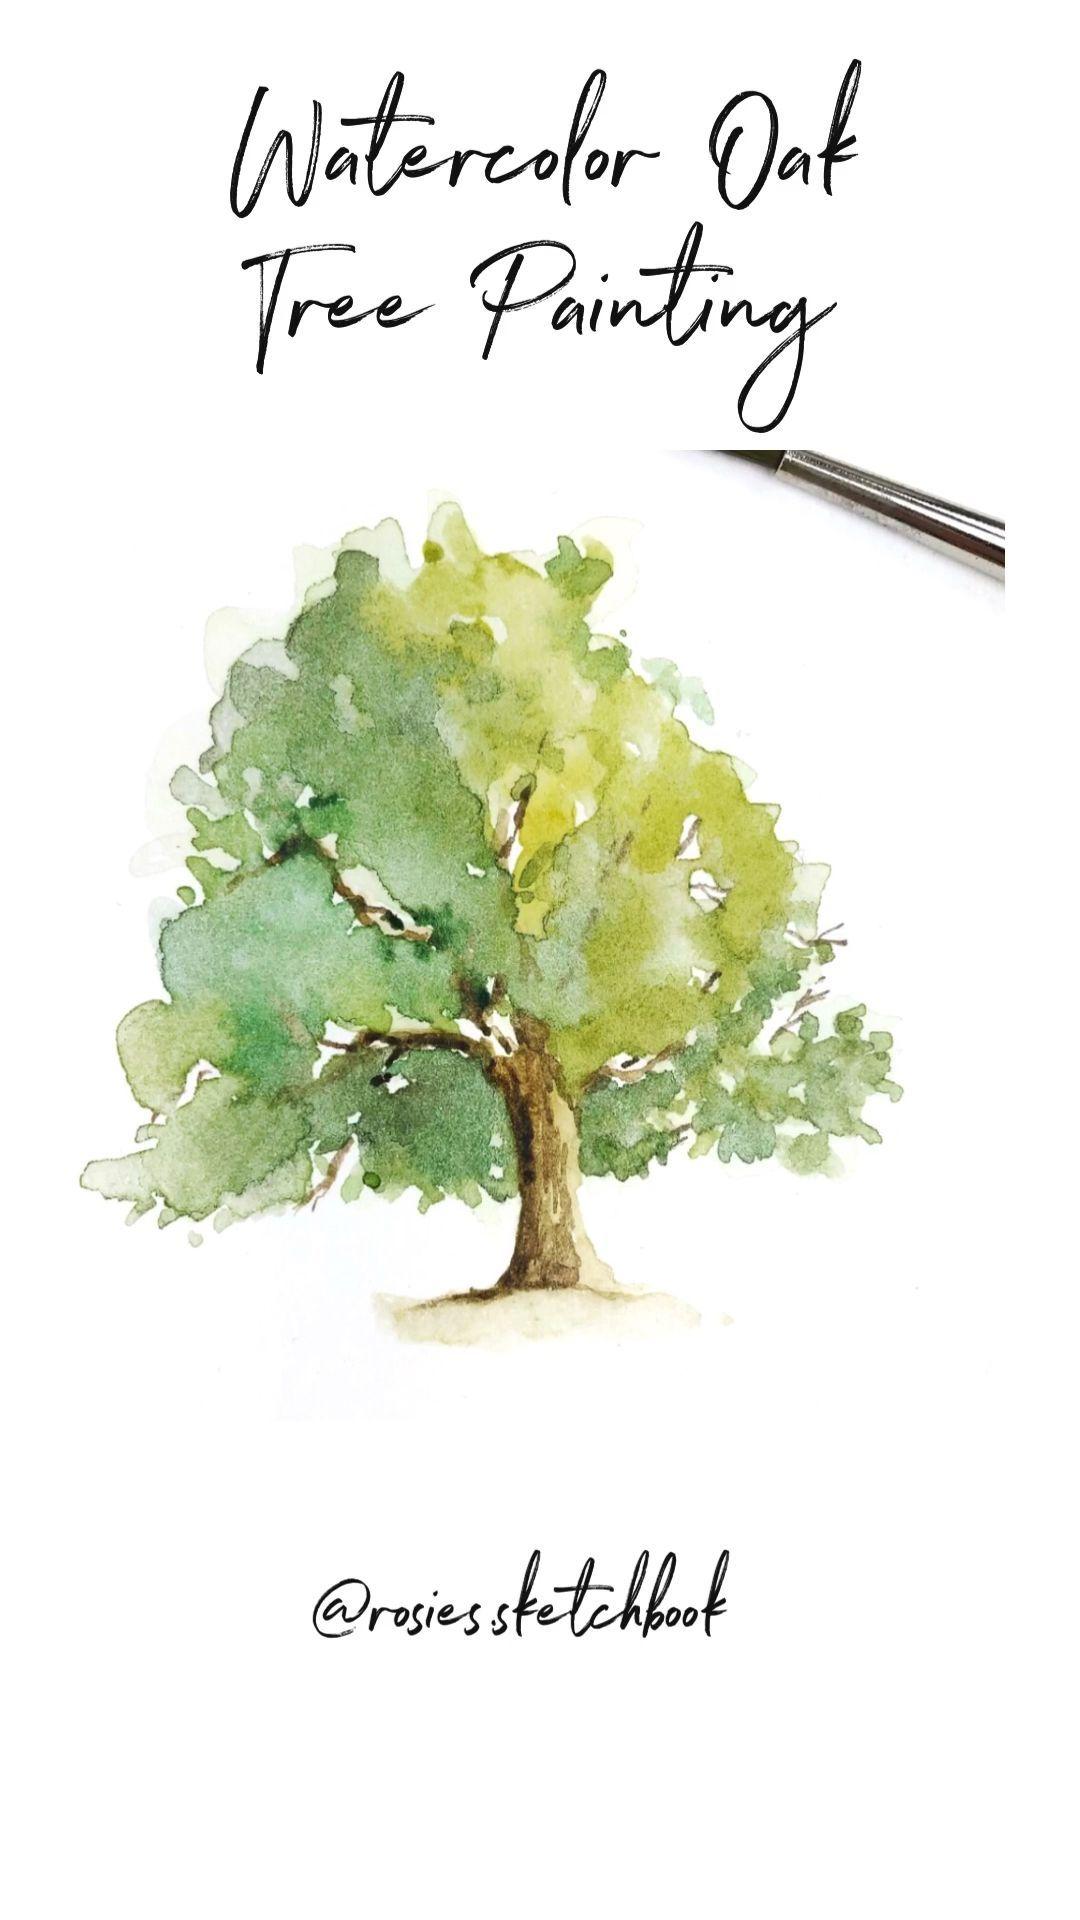 Watercolor Oak Tree Painting -  watercolor painting tutorial  - #AbstractPaintings #FineArt #Oak #painting #tree #watercolor #WatercolorPainting